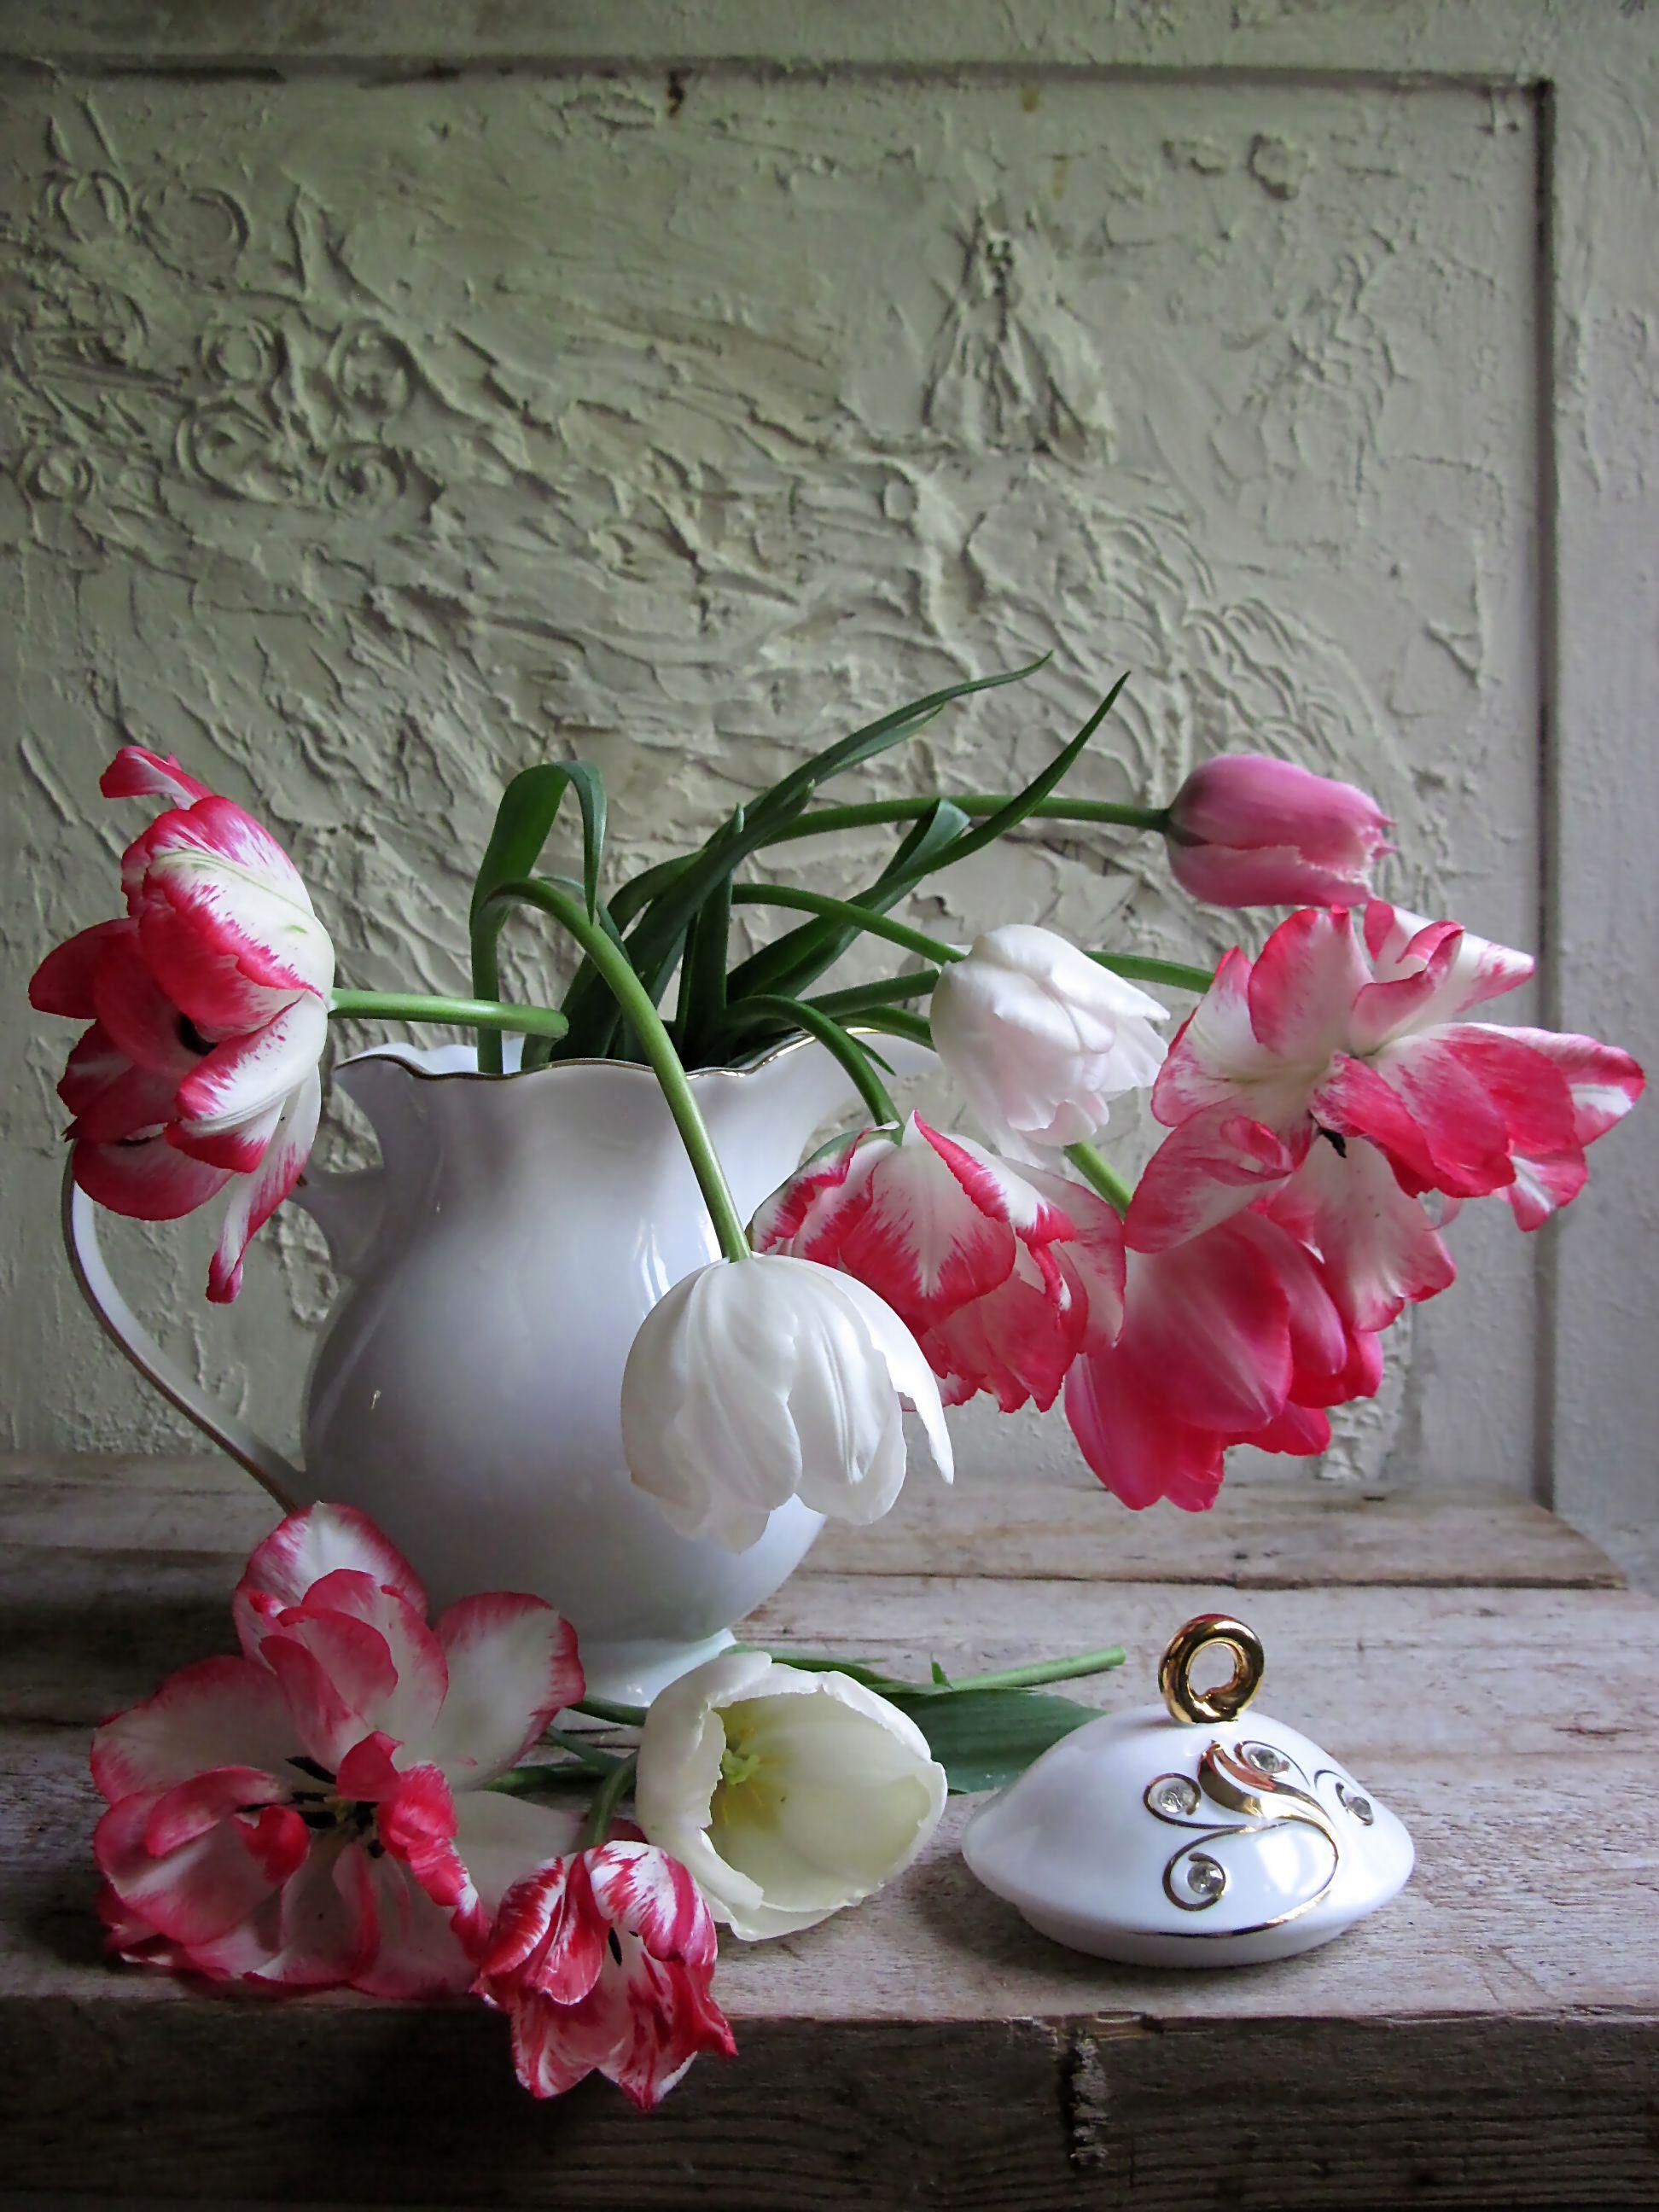 цветы, букет, тюльпаны, кувшин, фарфор, Тихомирова Наталия